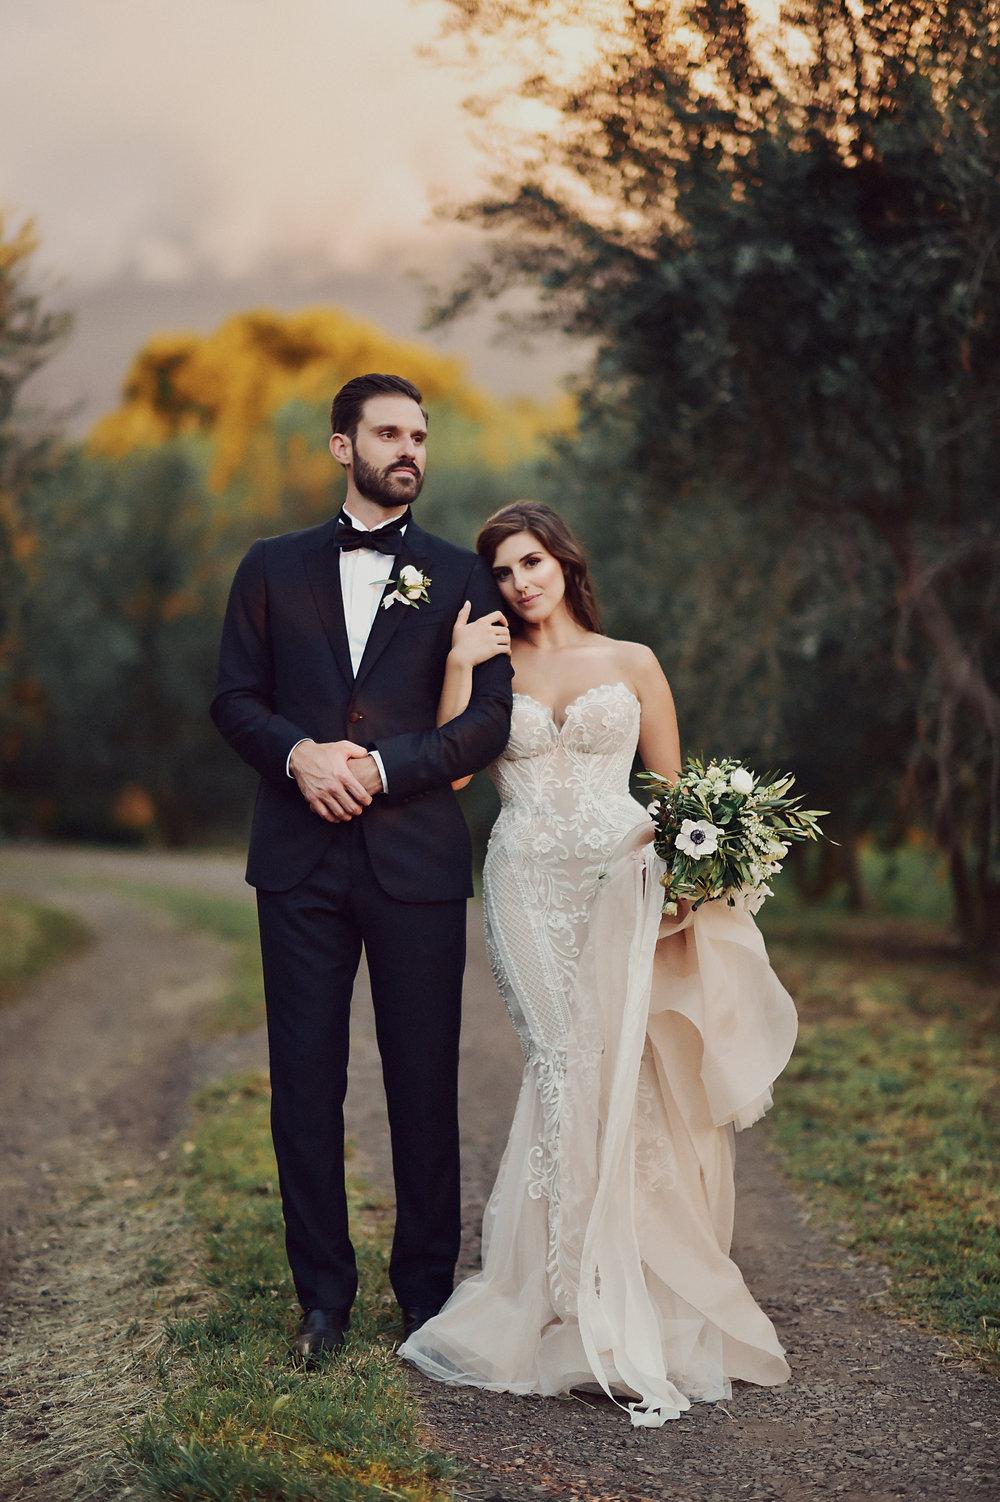 Adam+Stephanie_TamizPhotography_356.jpg